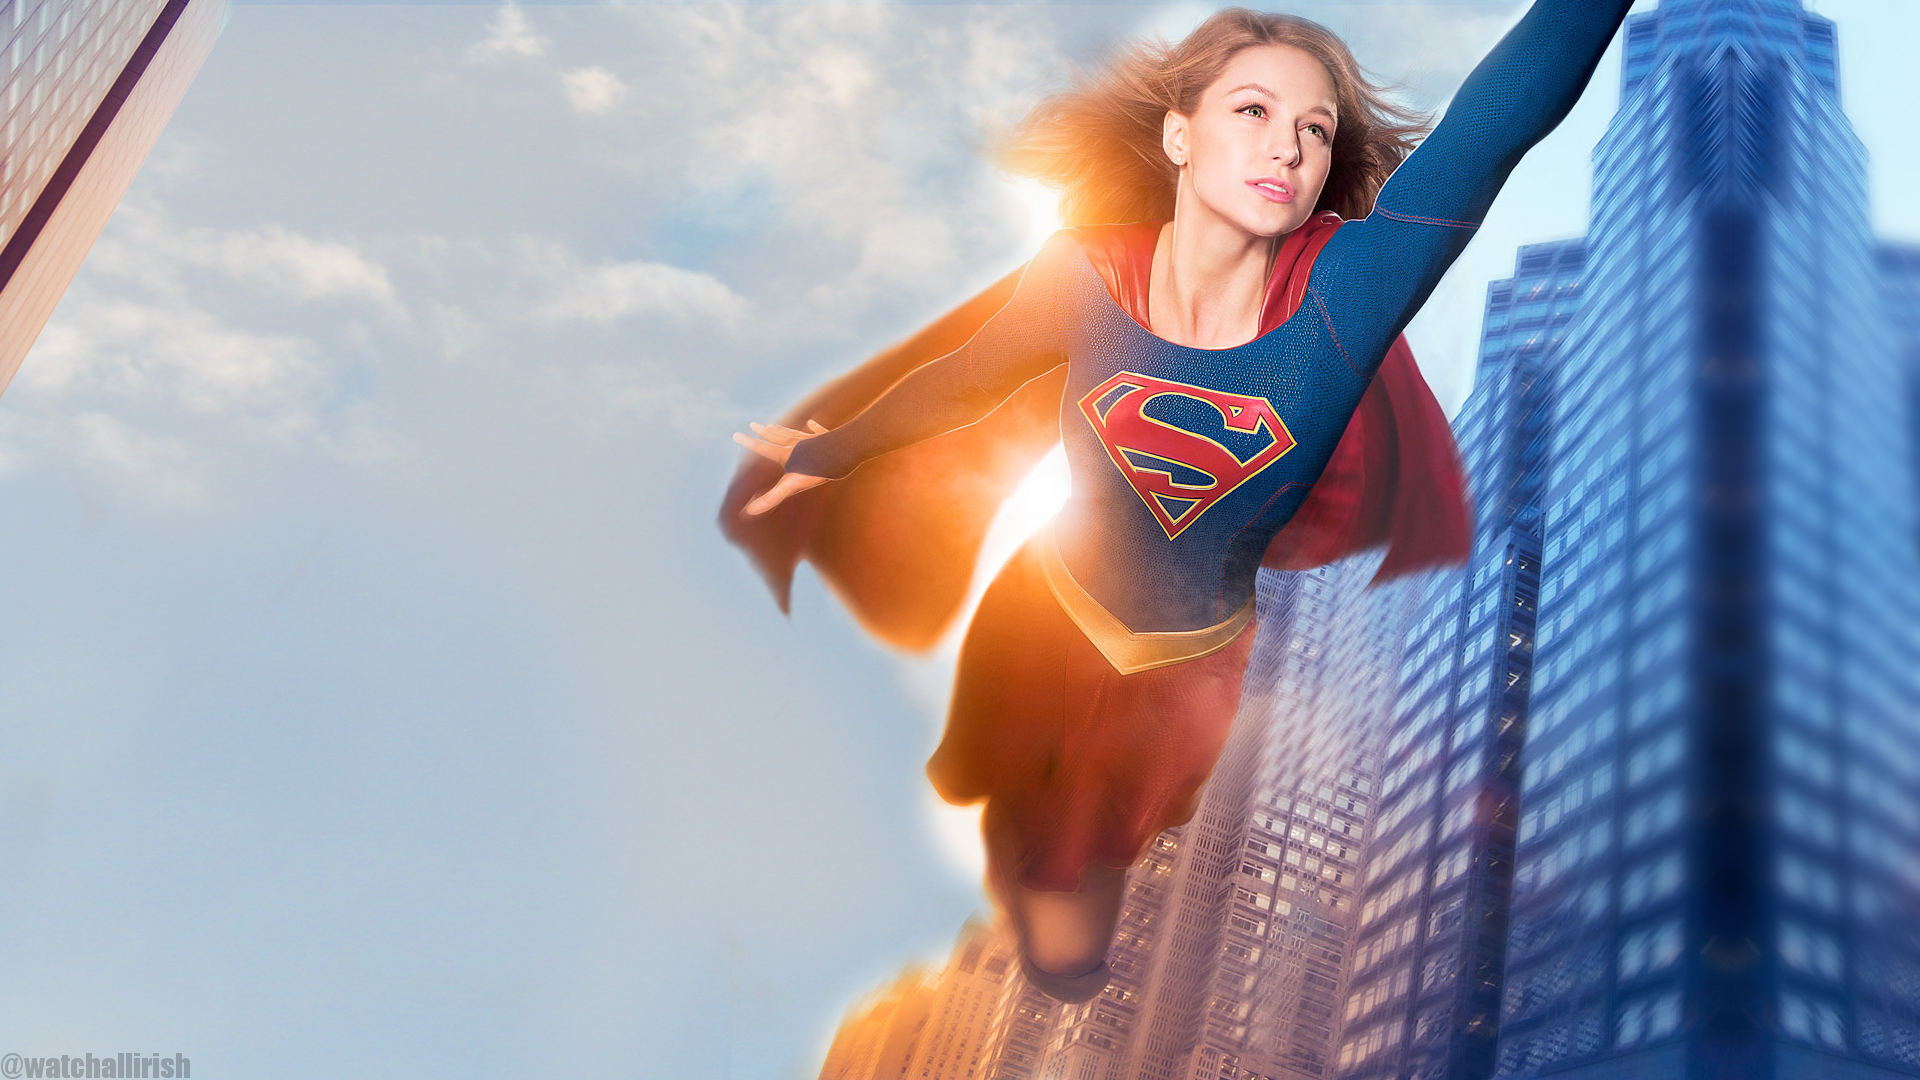 supergirl wallpaper 1920x1080